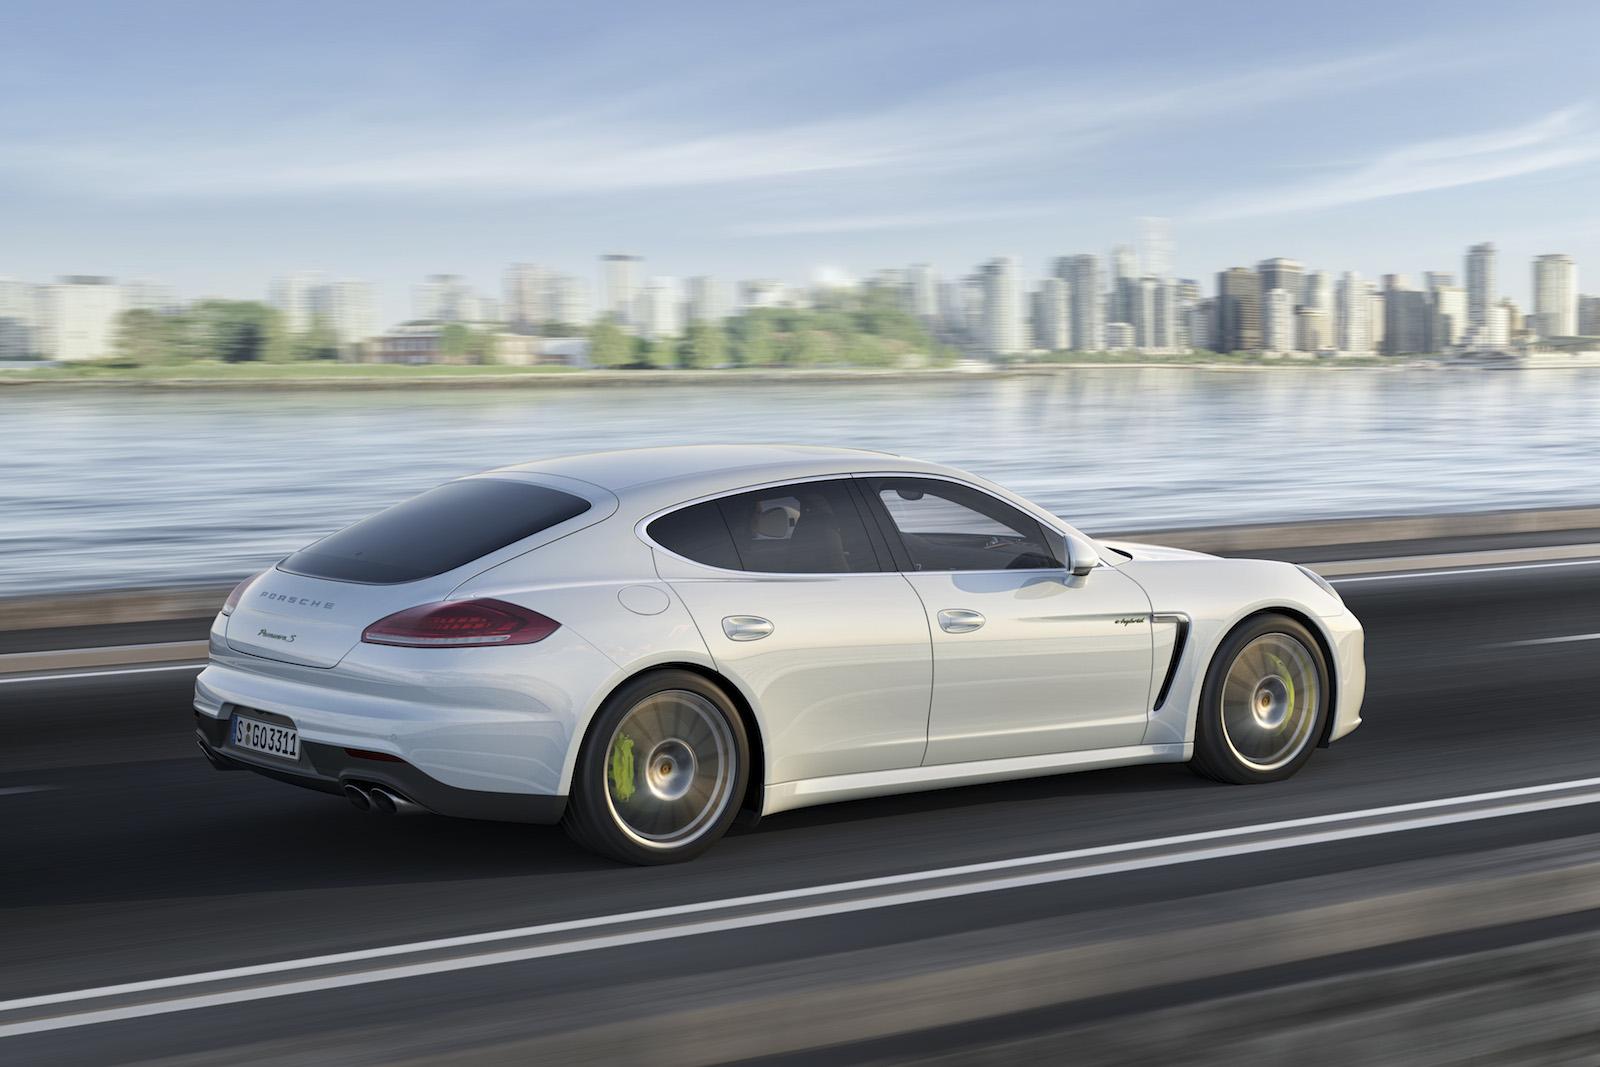 2016 porsche panamera review ratings specs prices and photos the car connection - Porsche 2015 4 Door